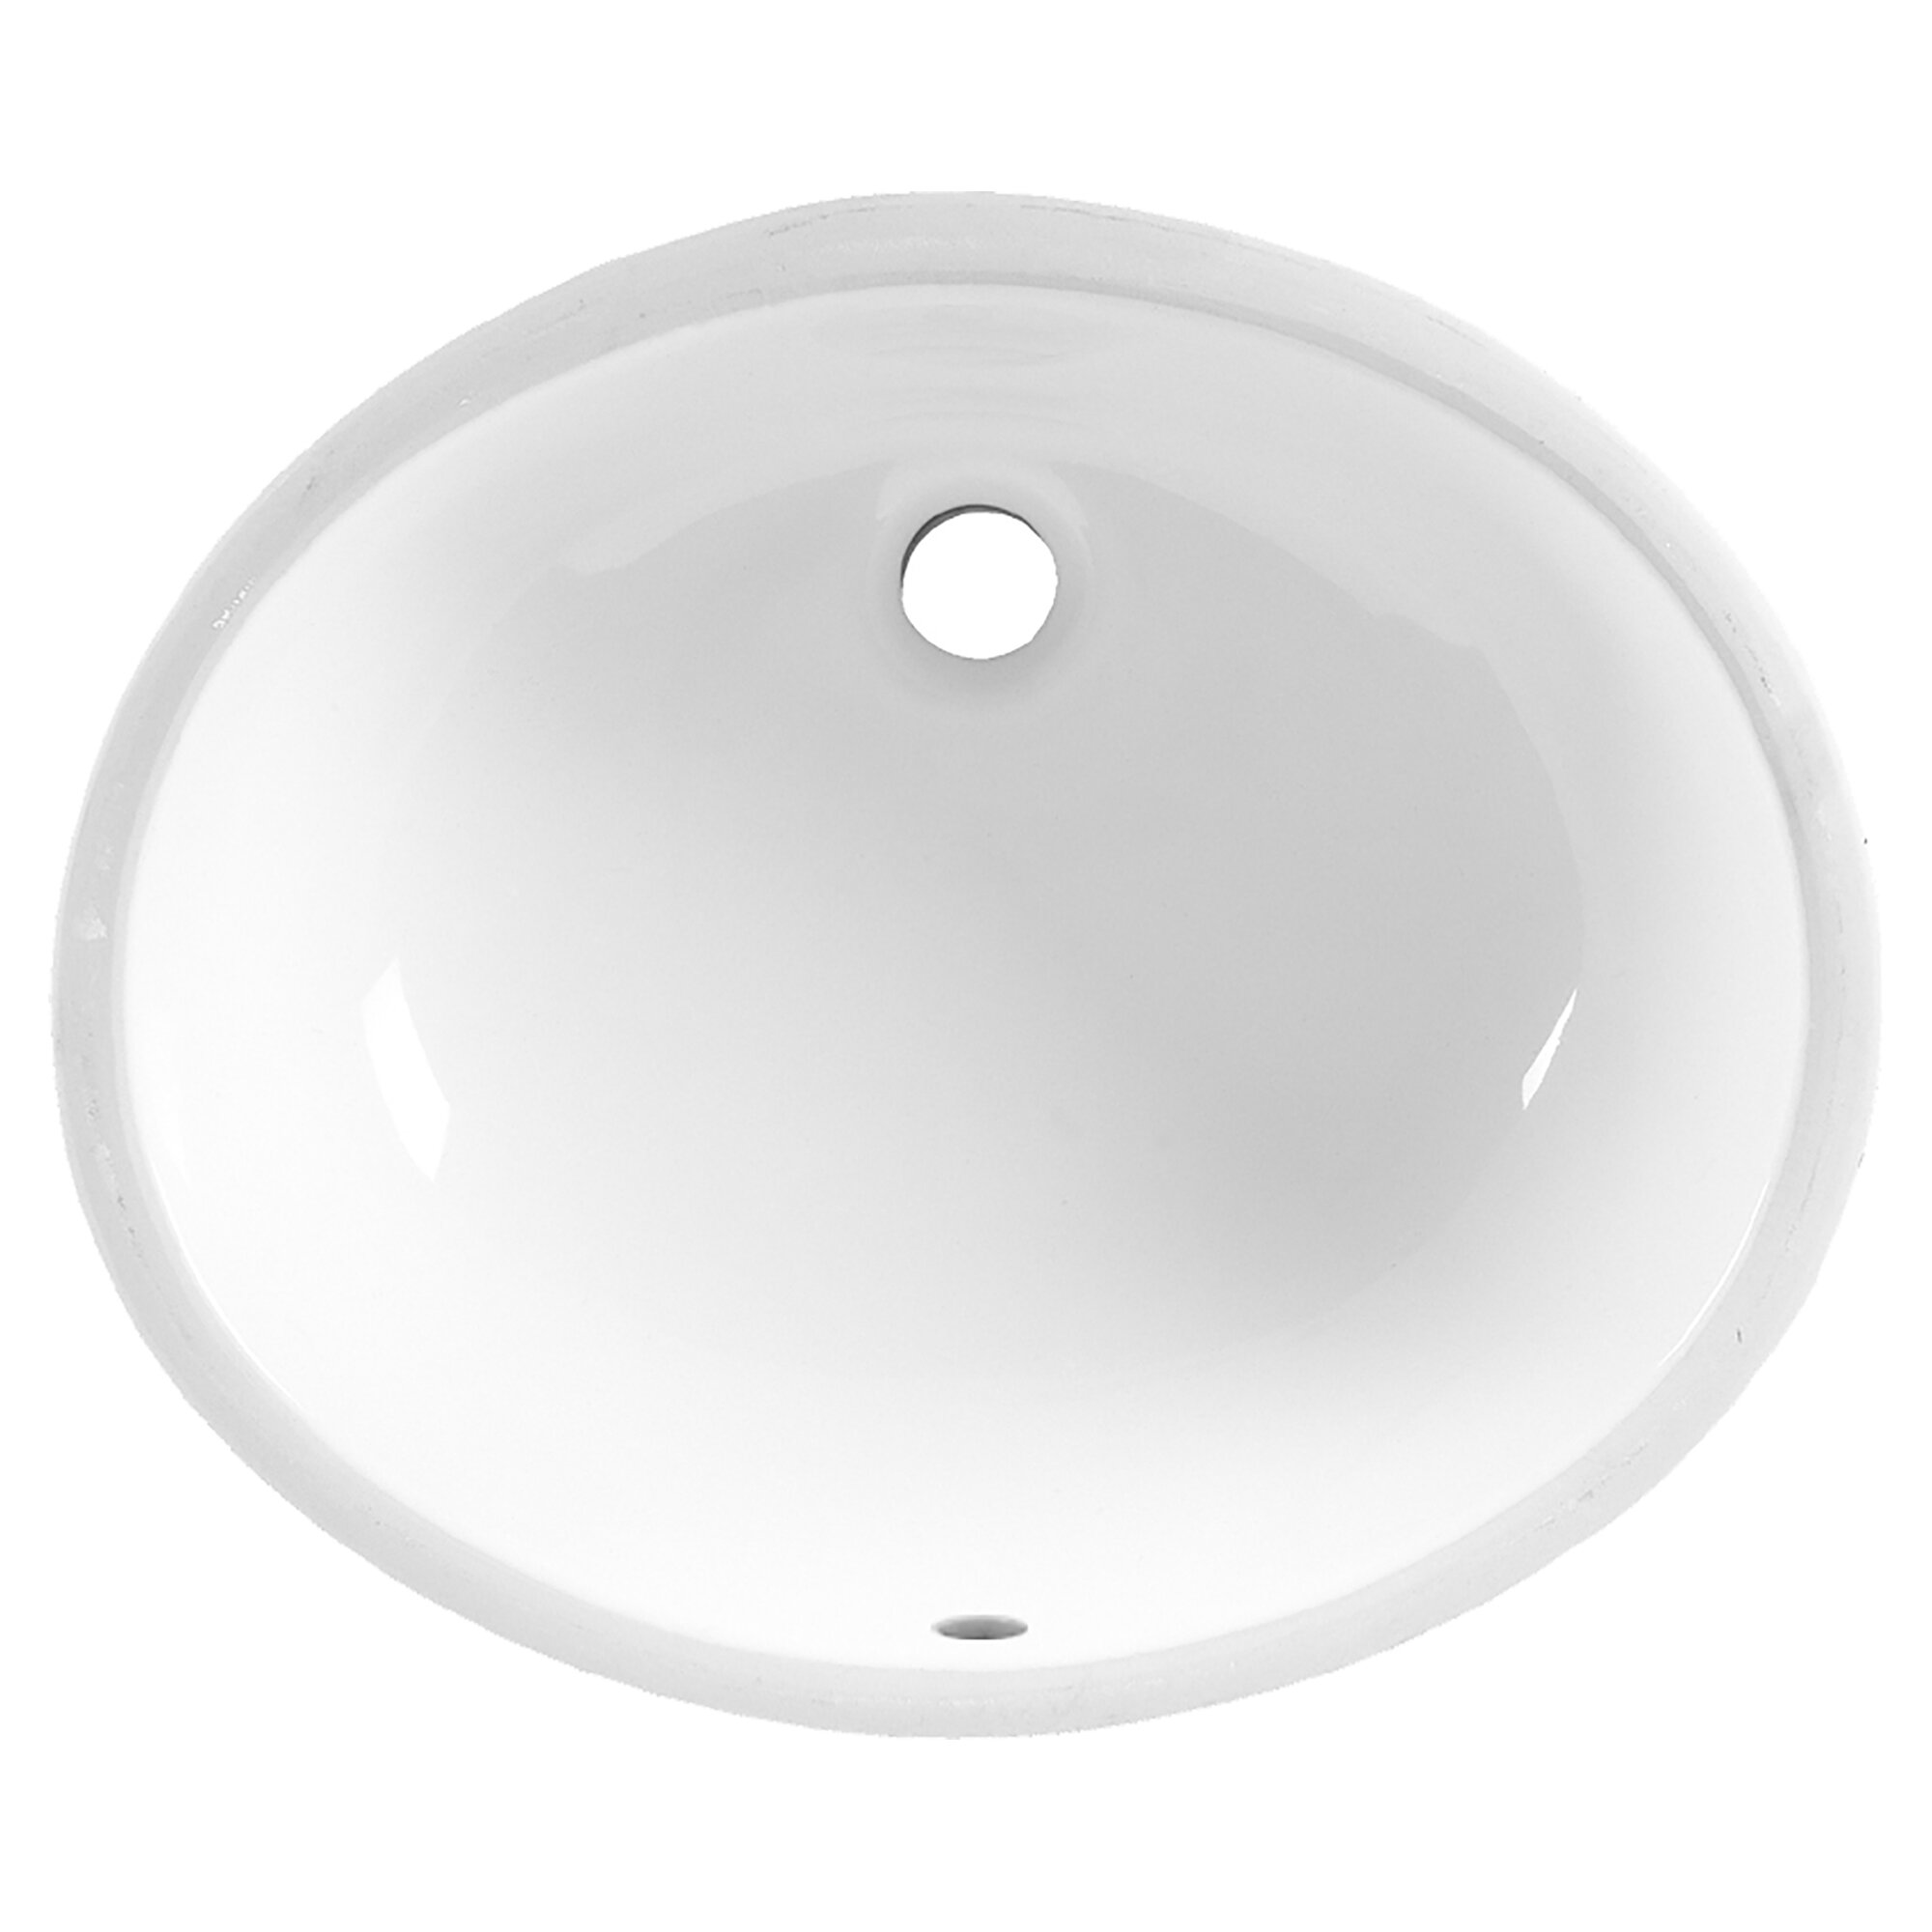 American Standard Ovalyn White Vitreous China Circular Undermount Bathroom Sink With Overflow Reviews Wayfair